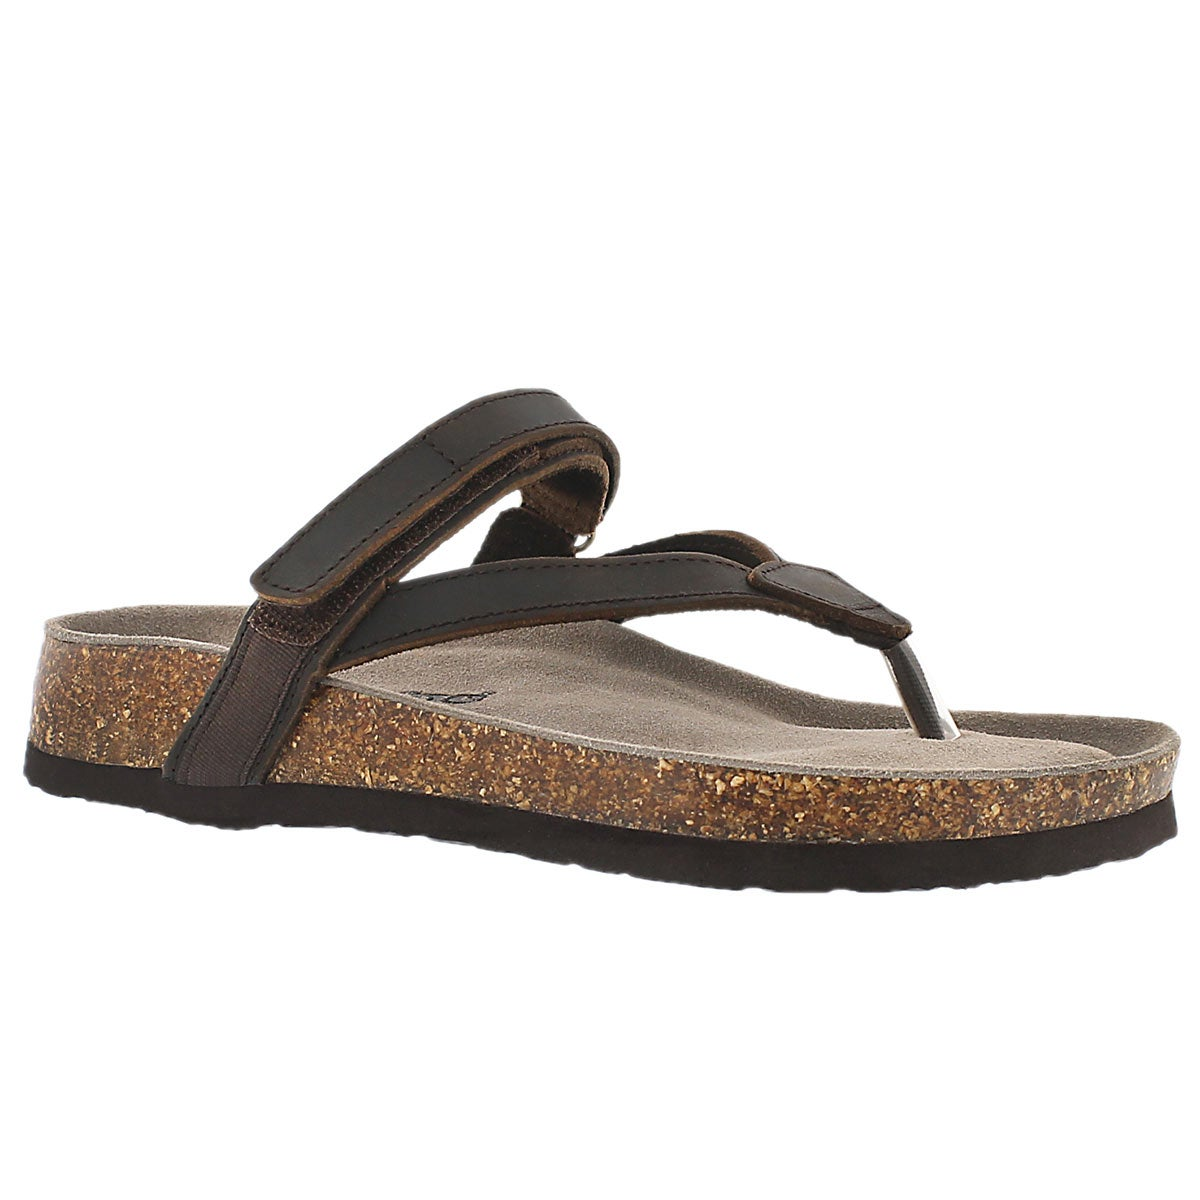 Lds Aisha brown crzy memory foam sandal